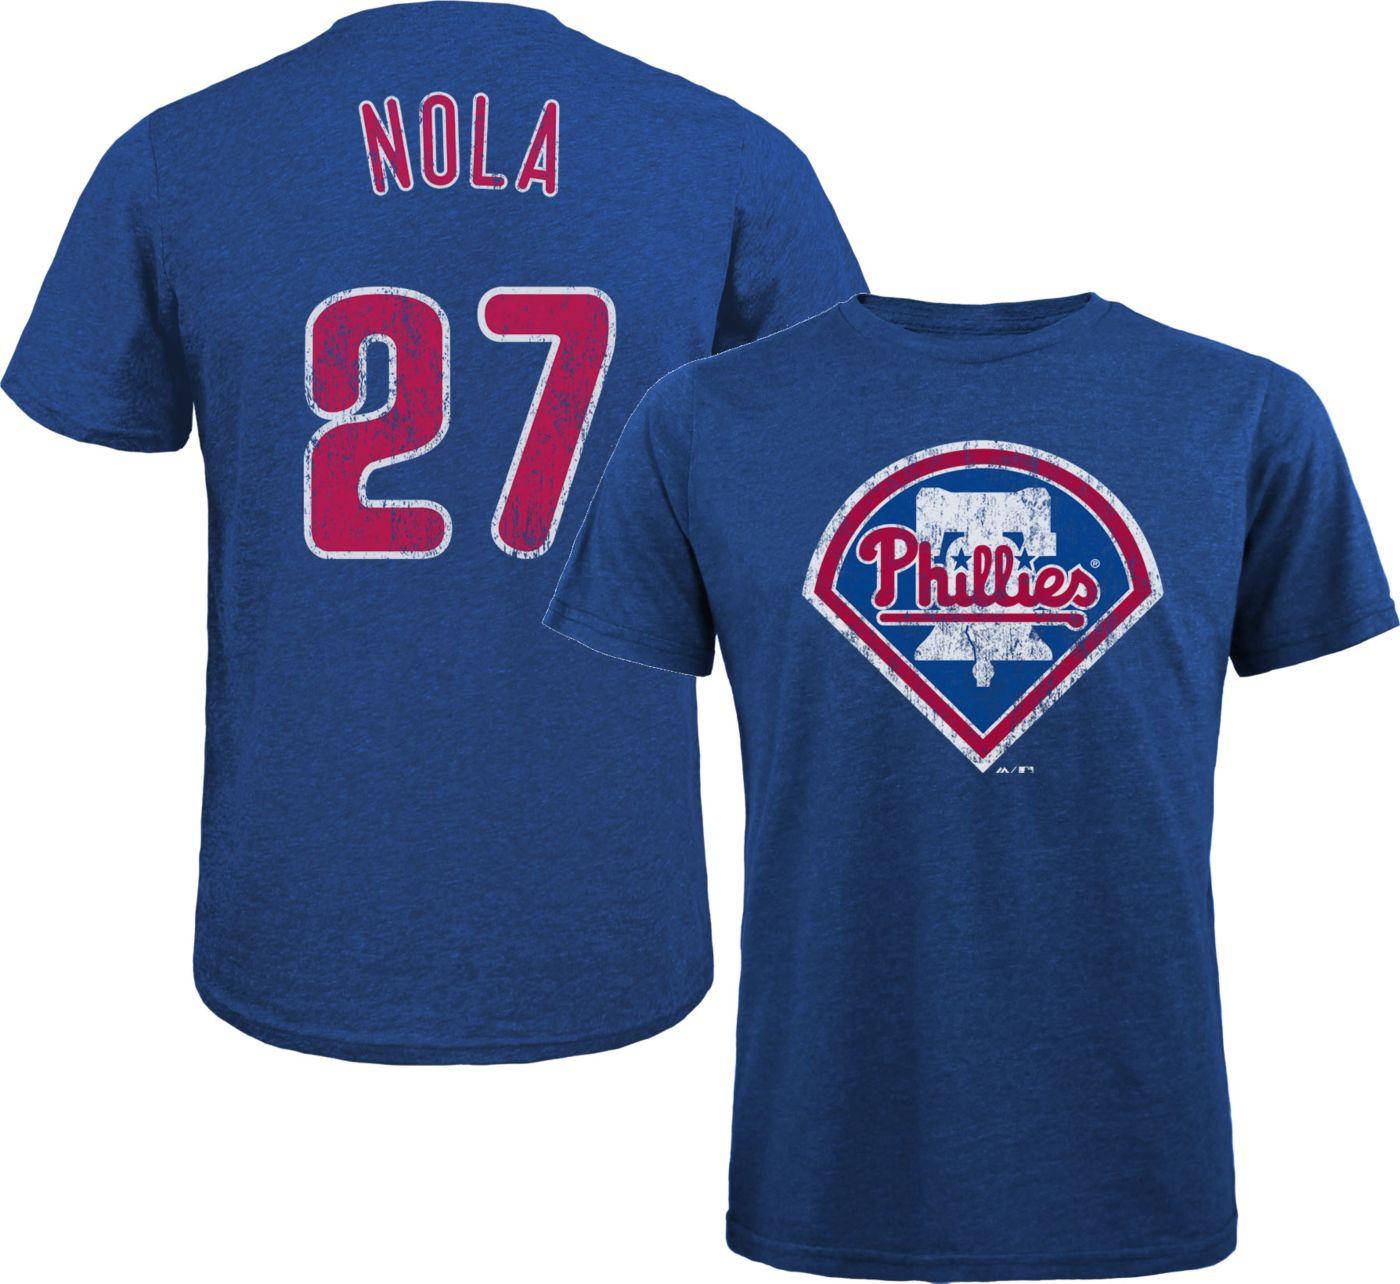 Majestic Threads Men's Philadelphia Phillies Aaron Nola Tri-Blend T-Shirt